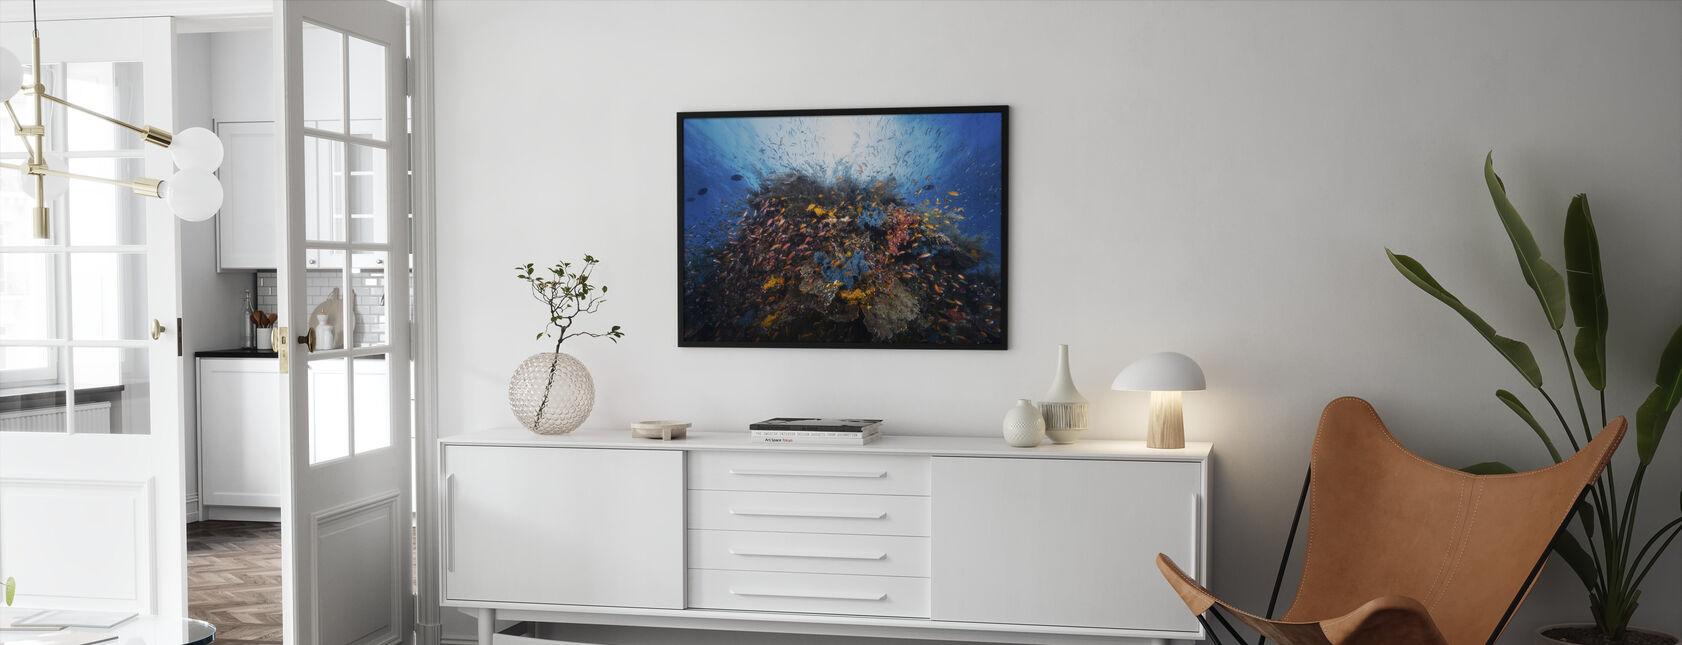 Liv Explosion - Inramad tavla - Vardagsrum